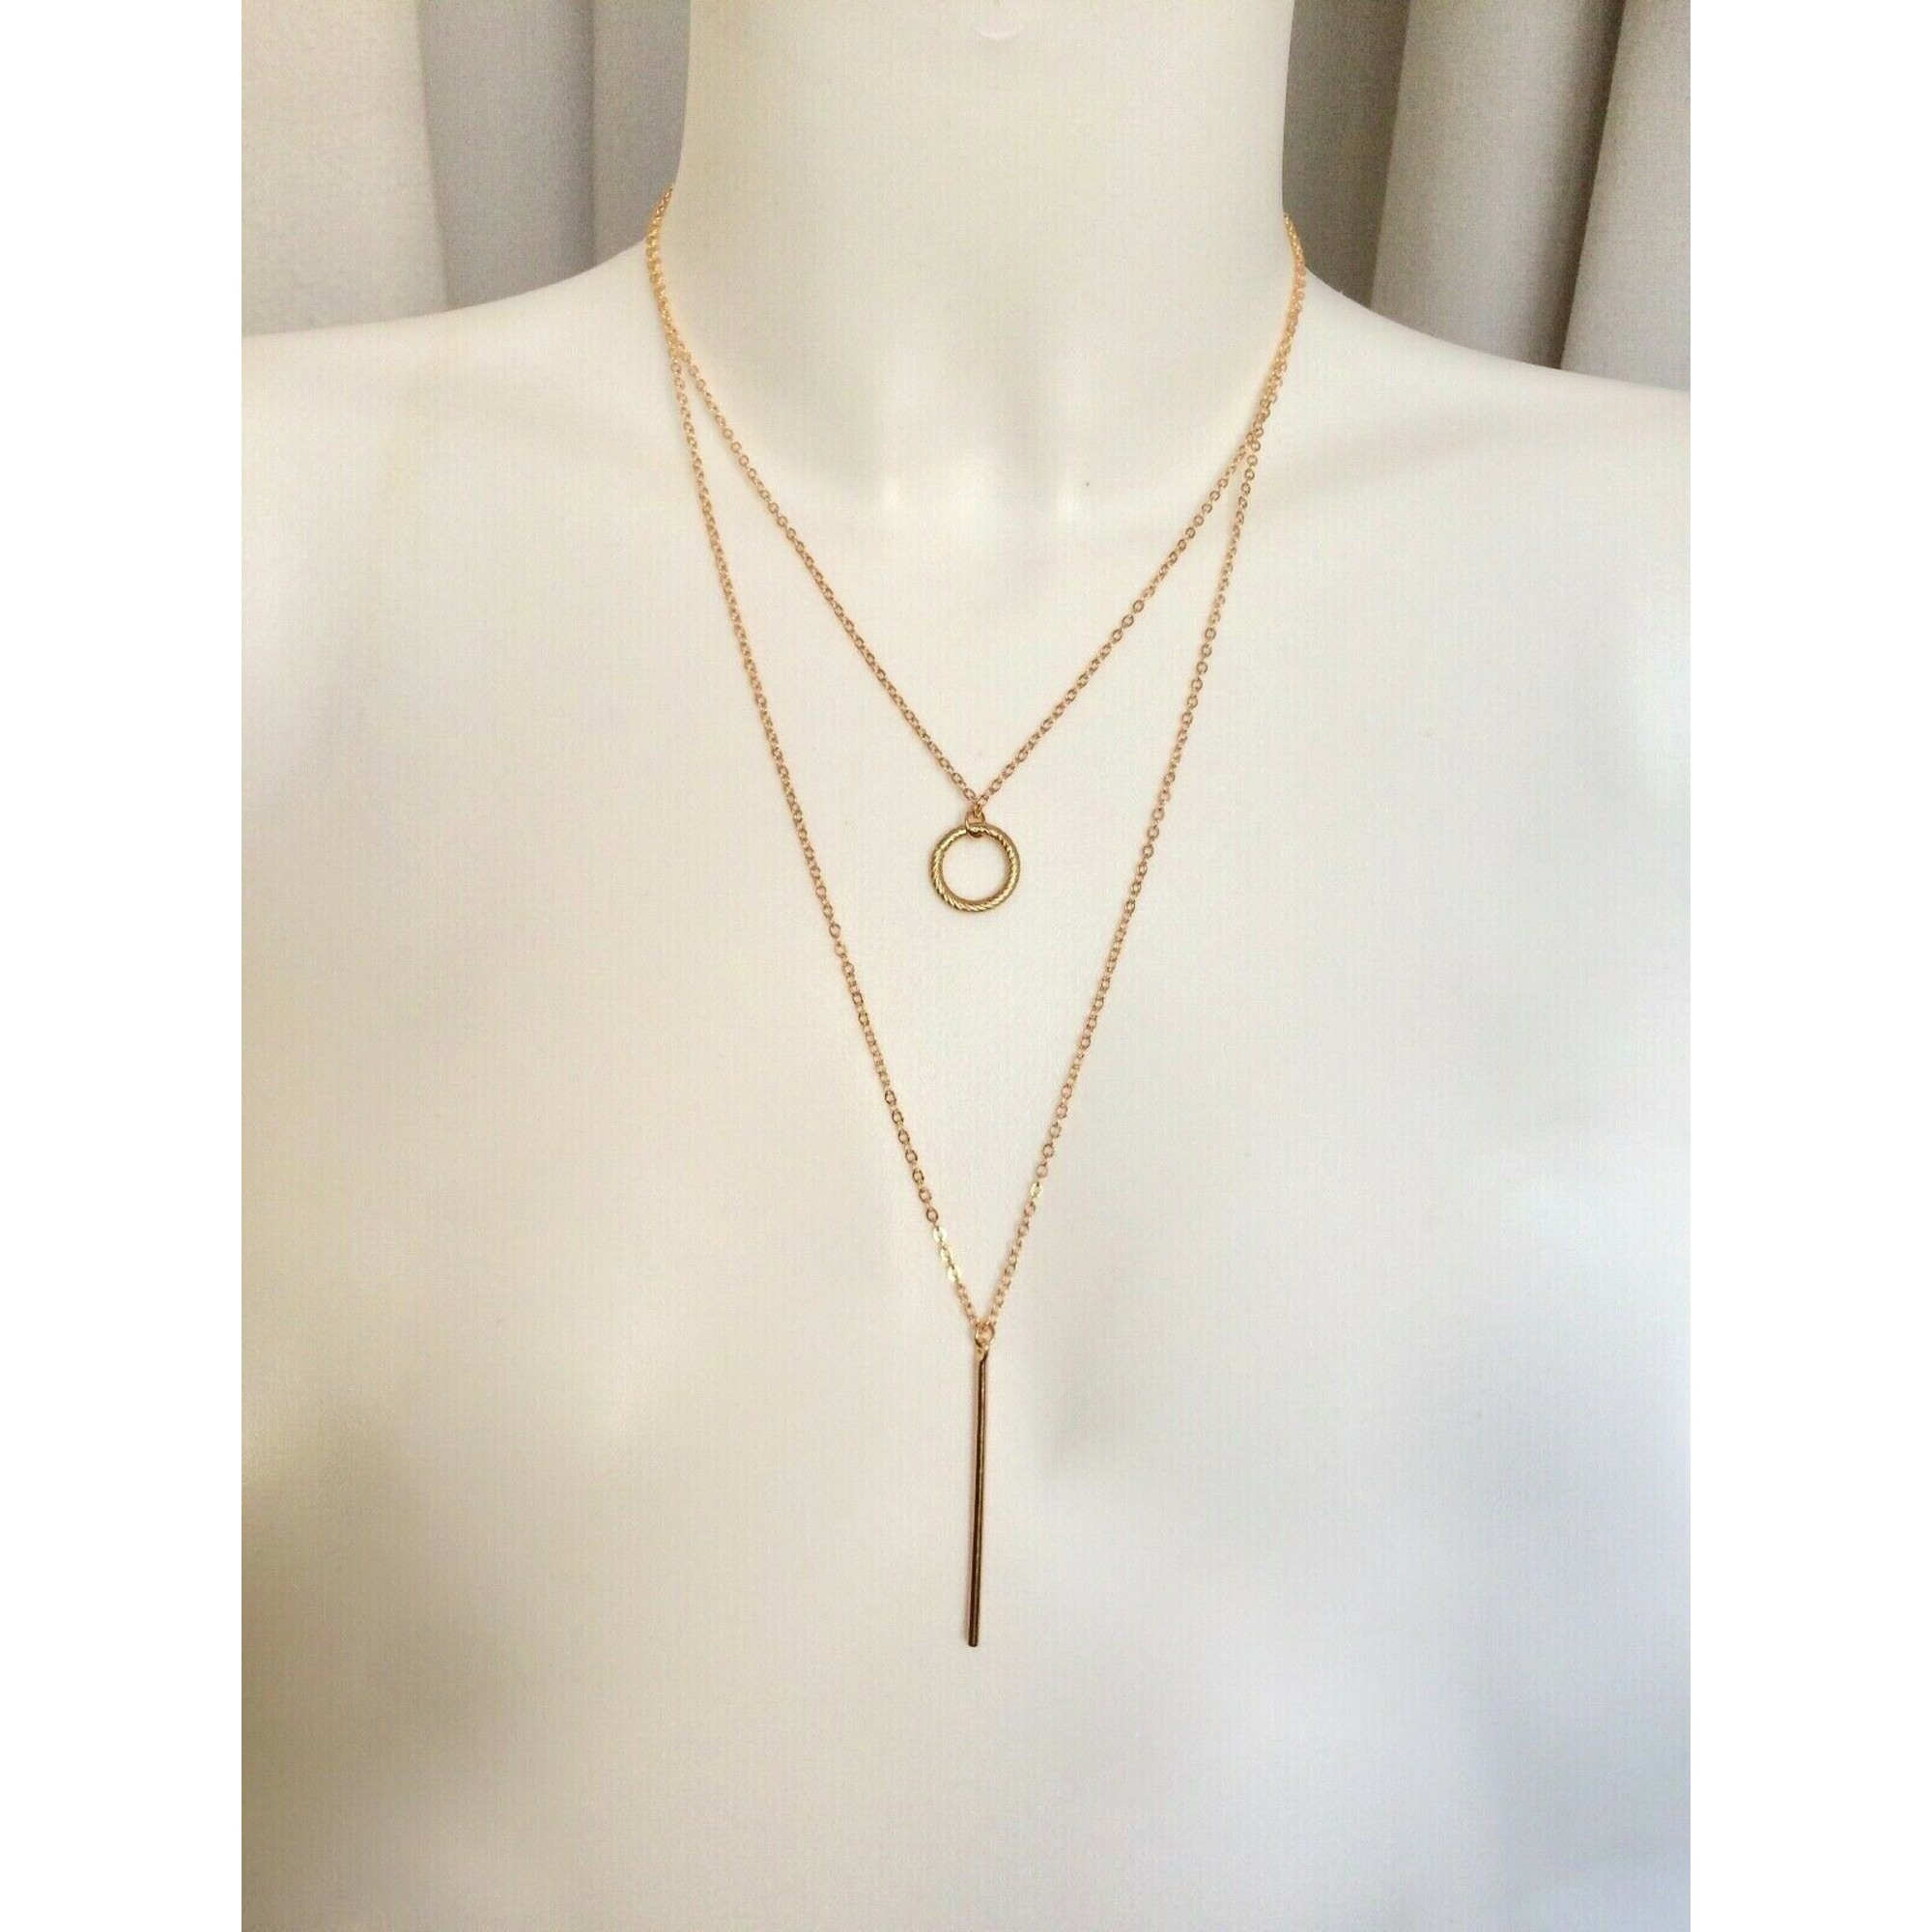 Pendentif, collier pendentif FASHION JEWELRY Doré, bronze, cuivre